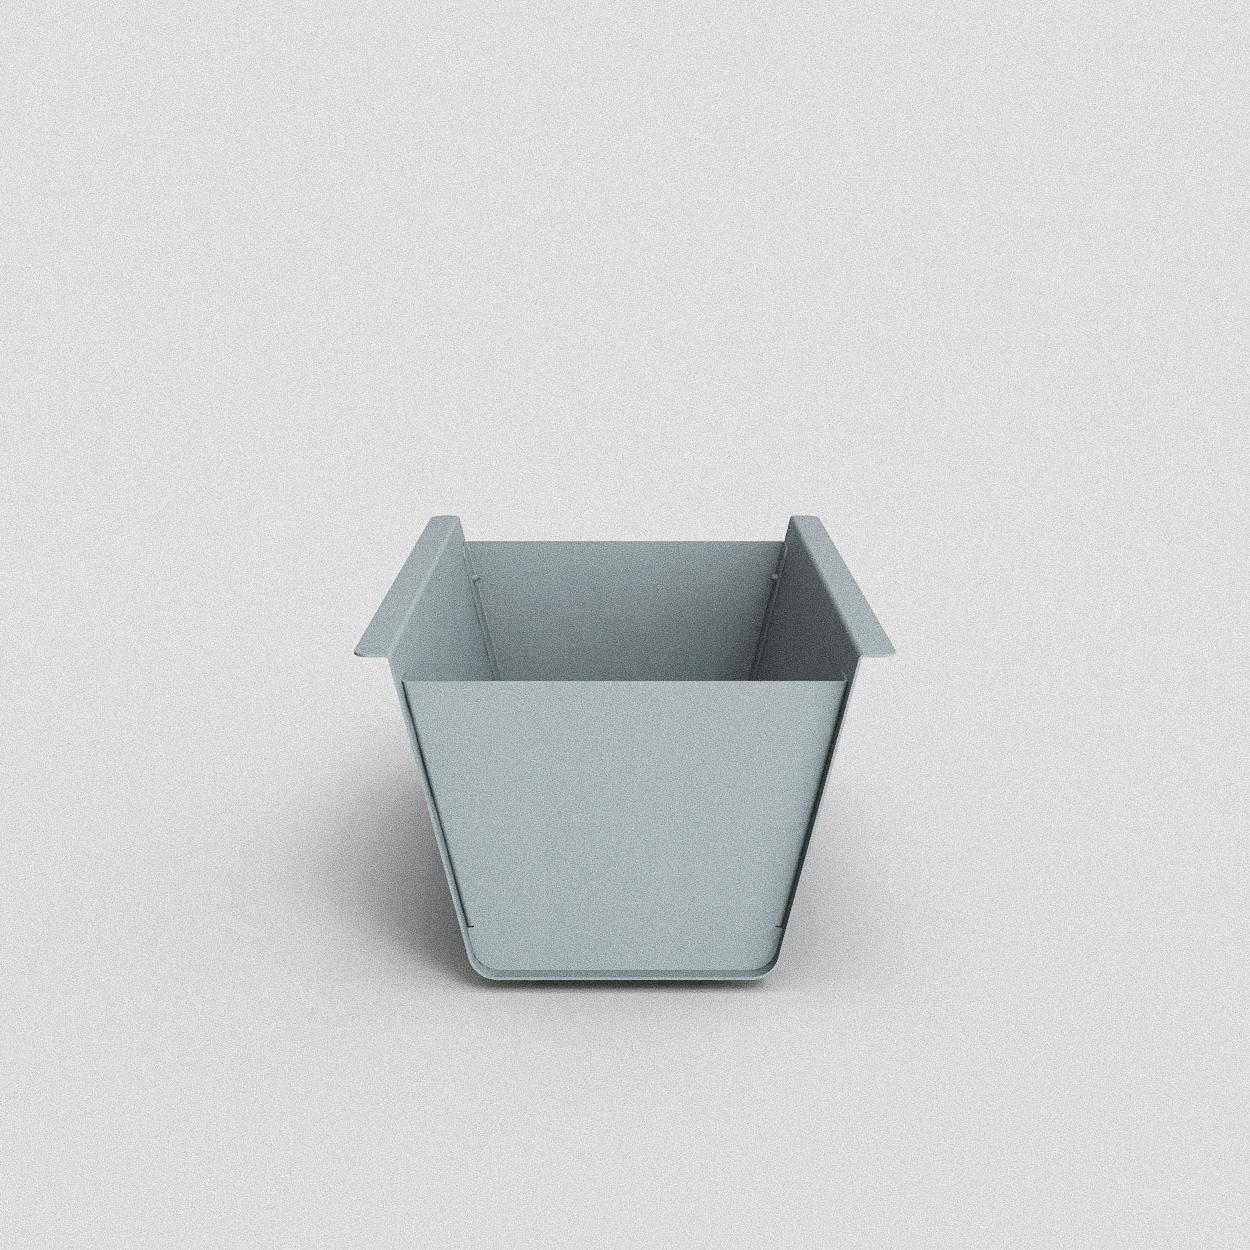 135L / Standardfärg: Granit